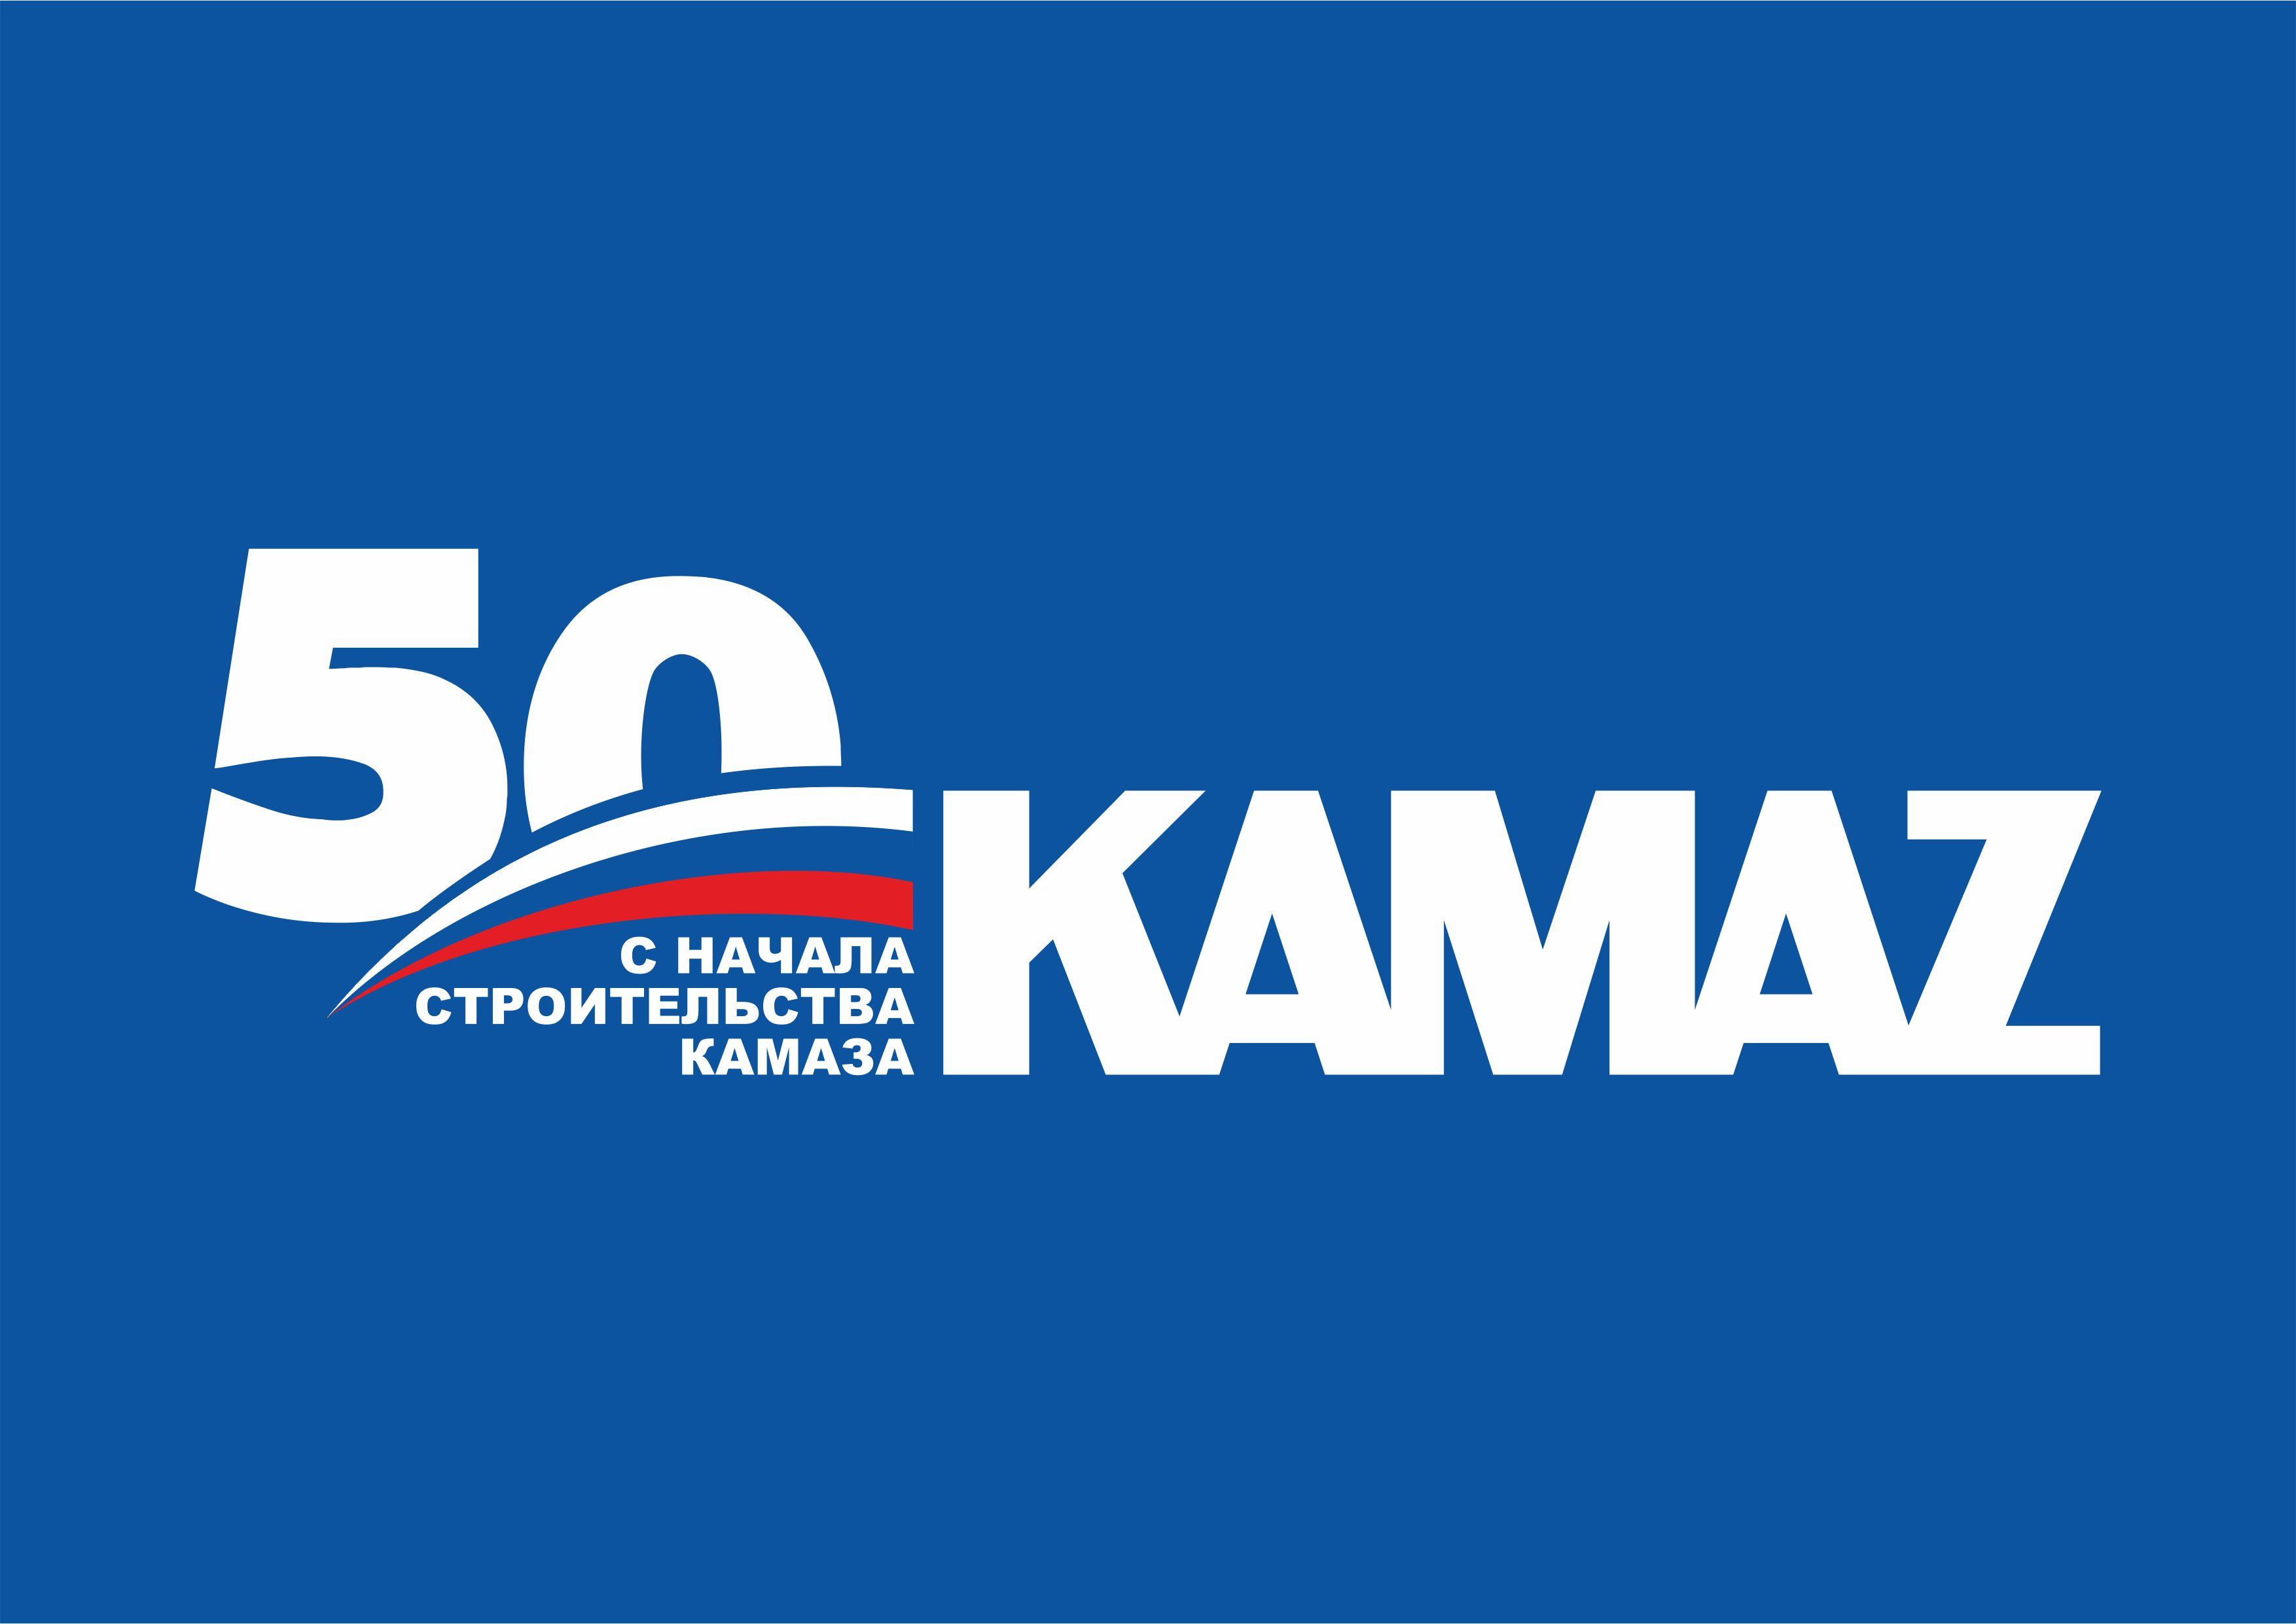 Видеоролики к юбилею «КАМАЗа»